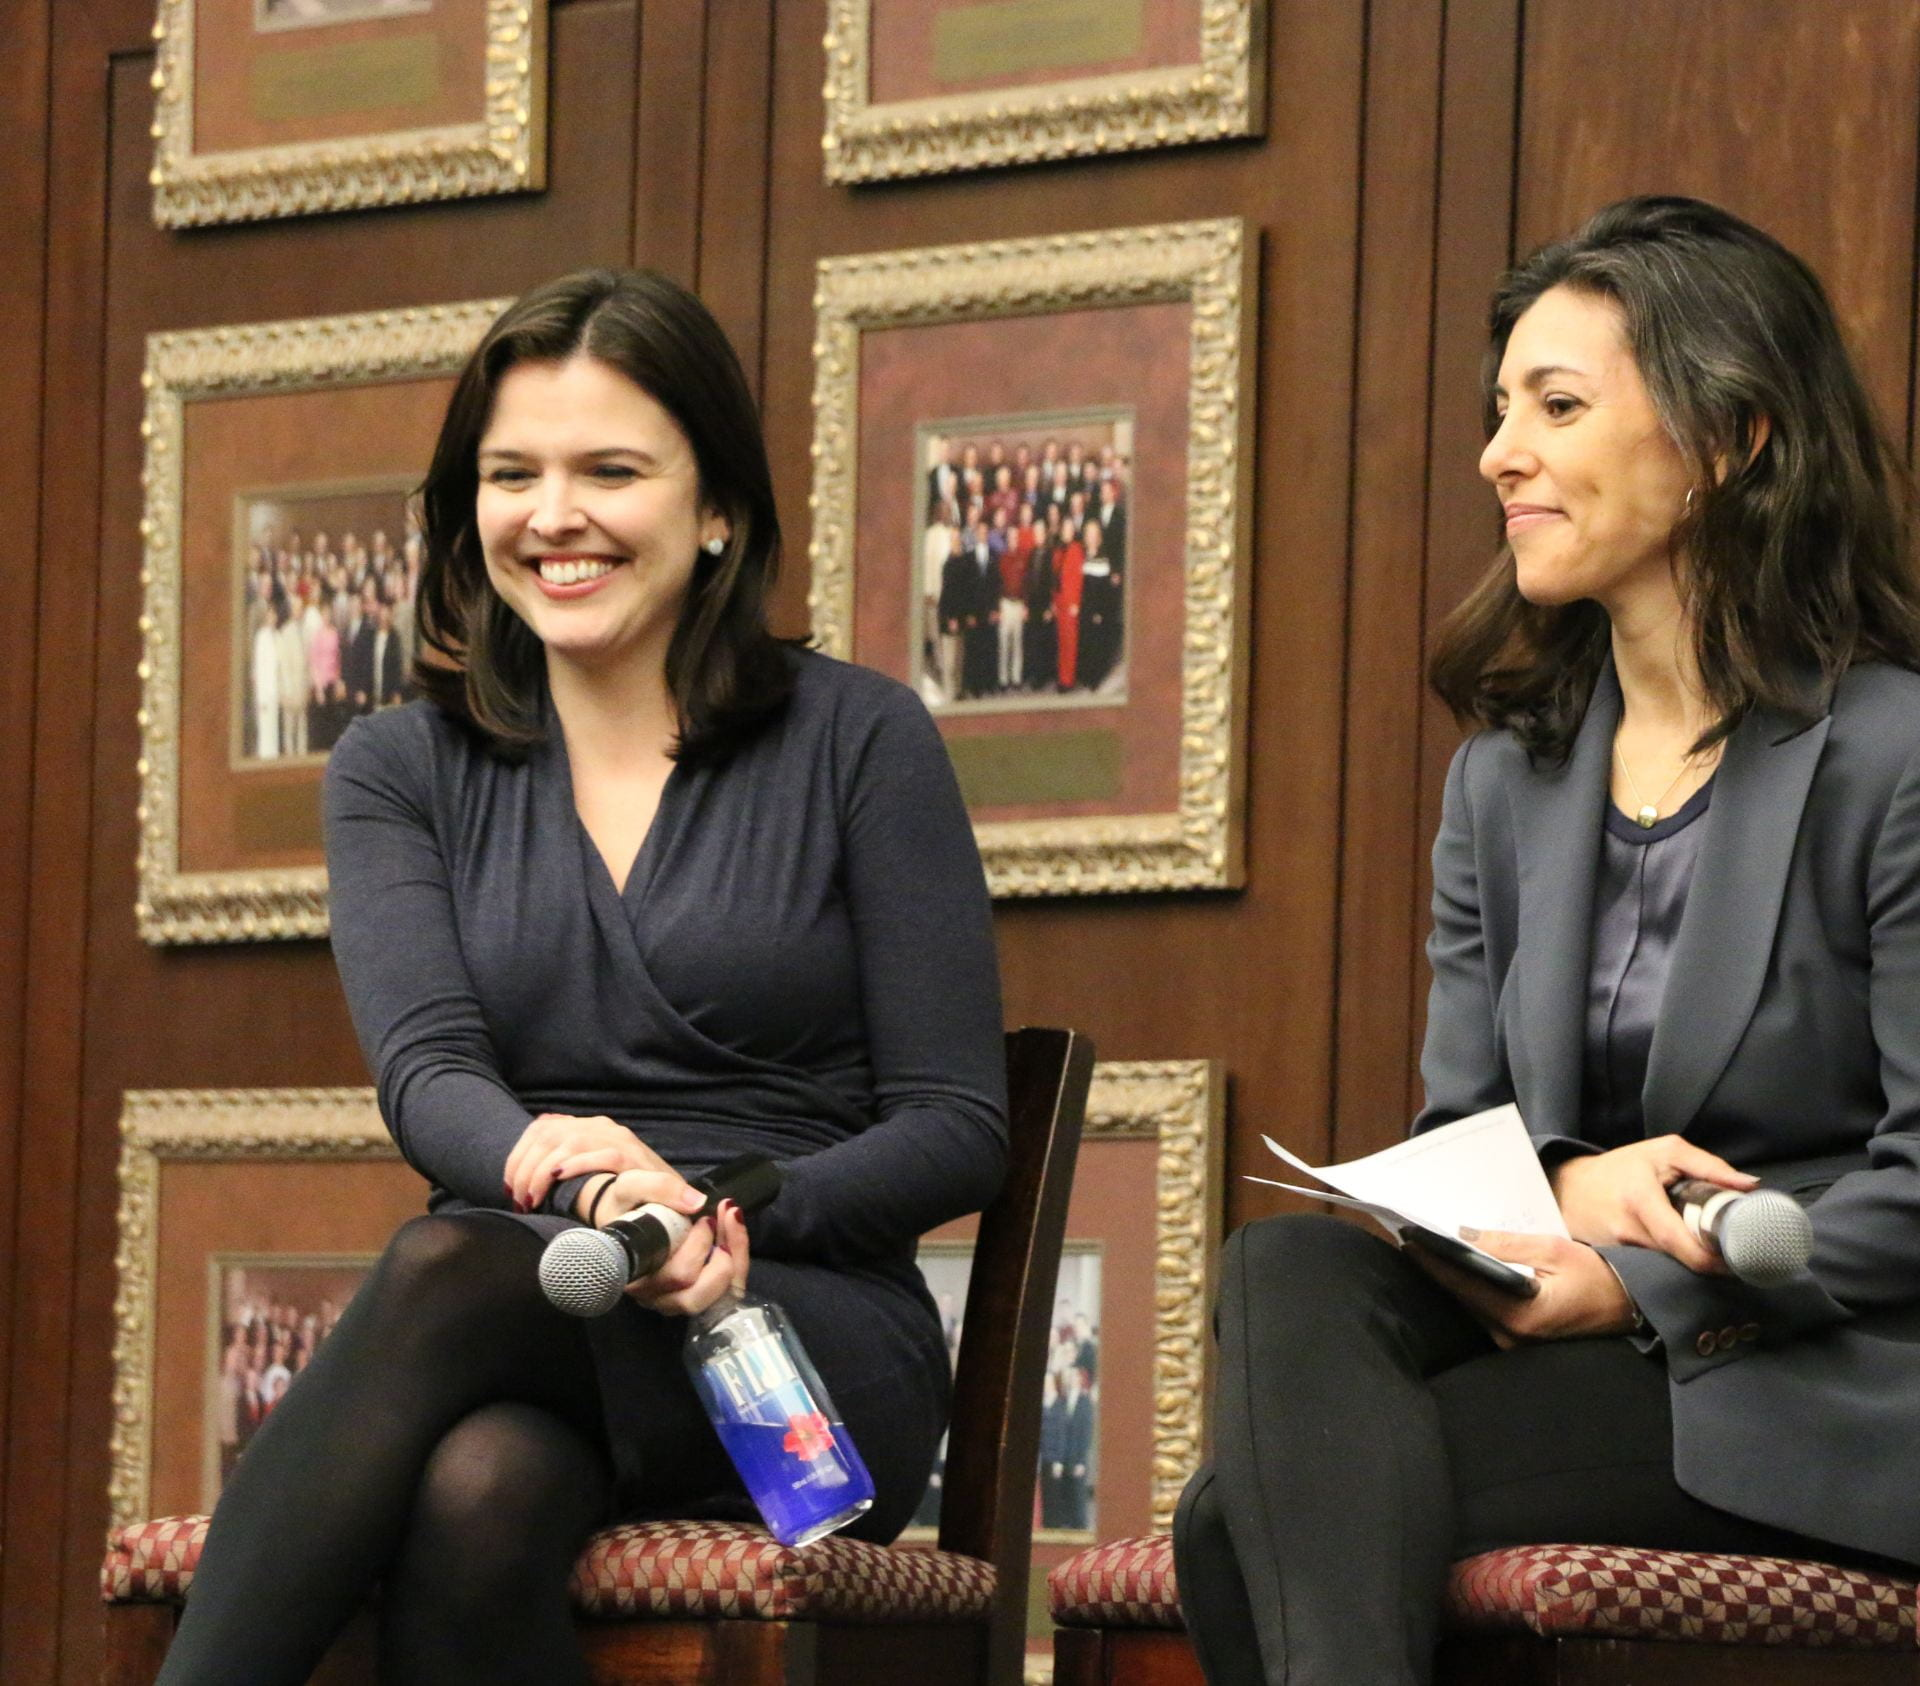 CNN political reporter Arlette Saenz and  New York TimesWhite House correspondent Julie Hirschfeld Davis